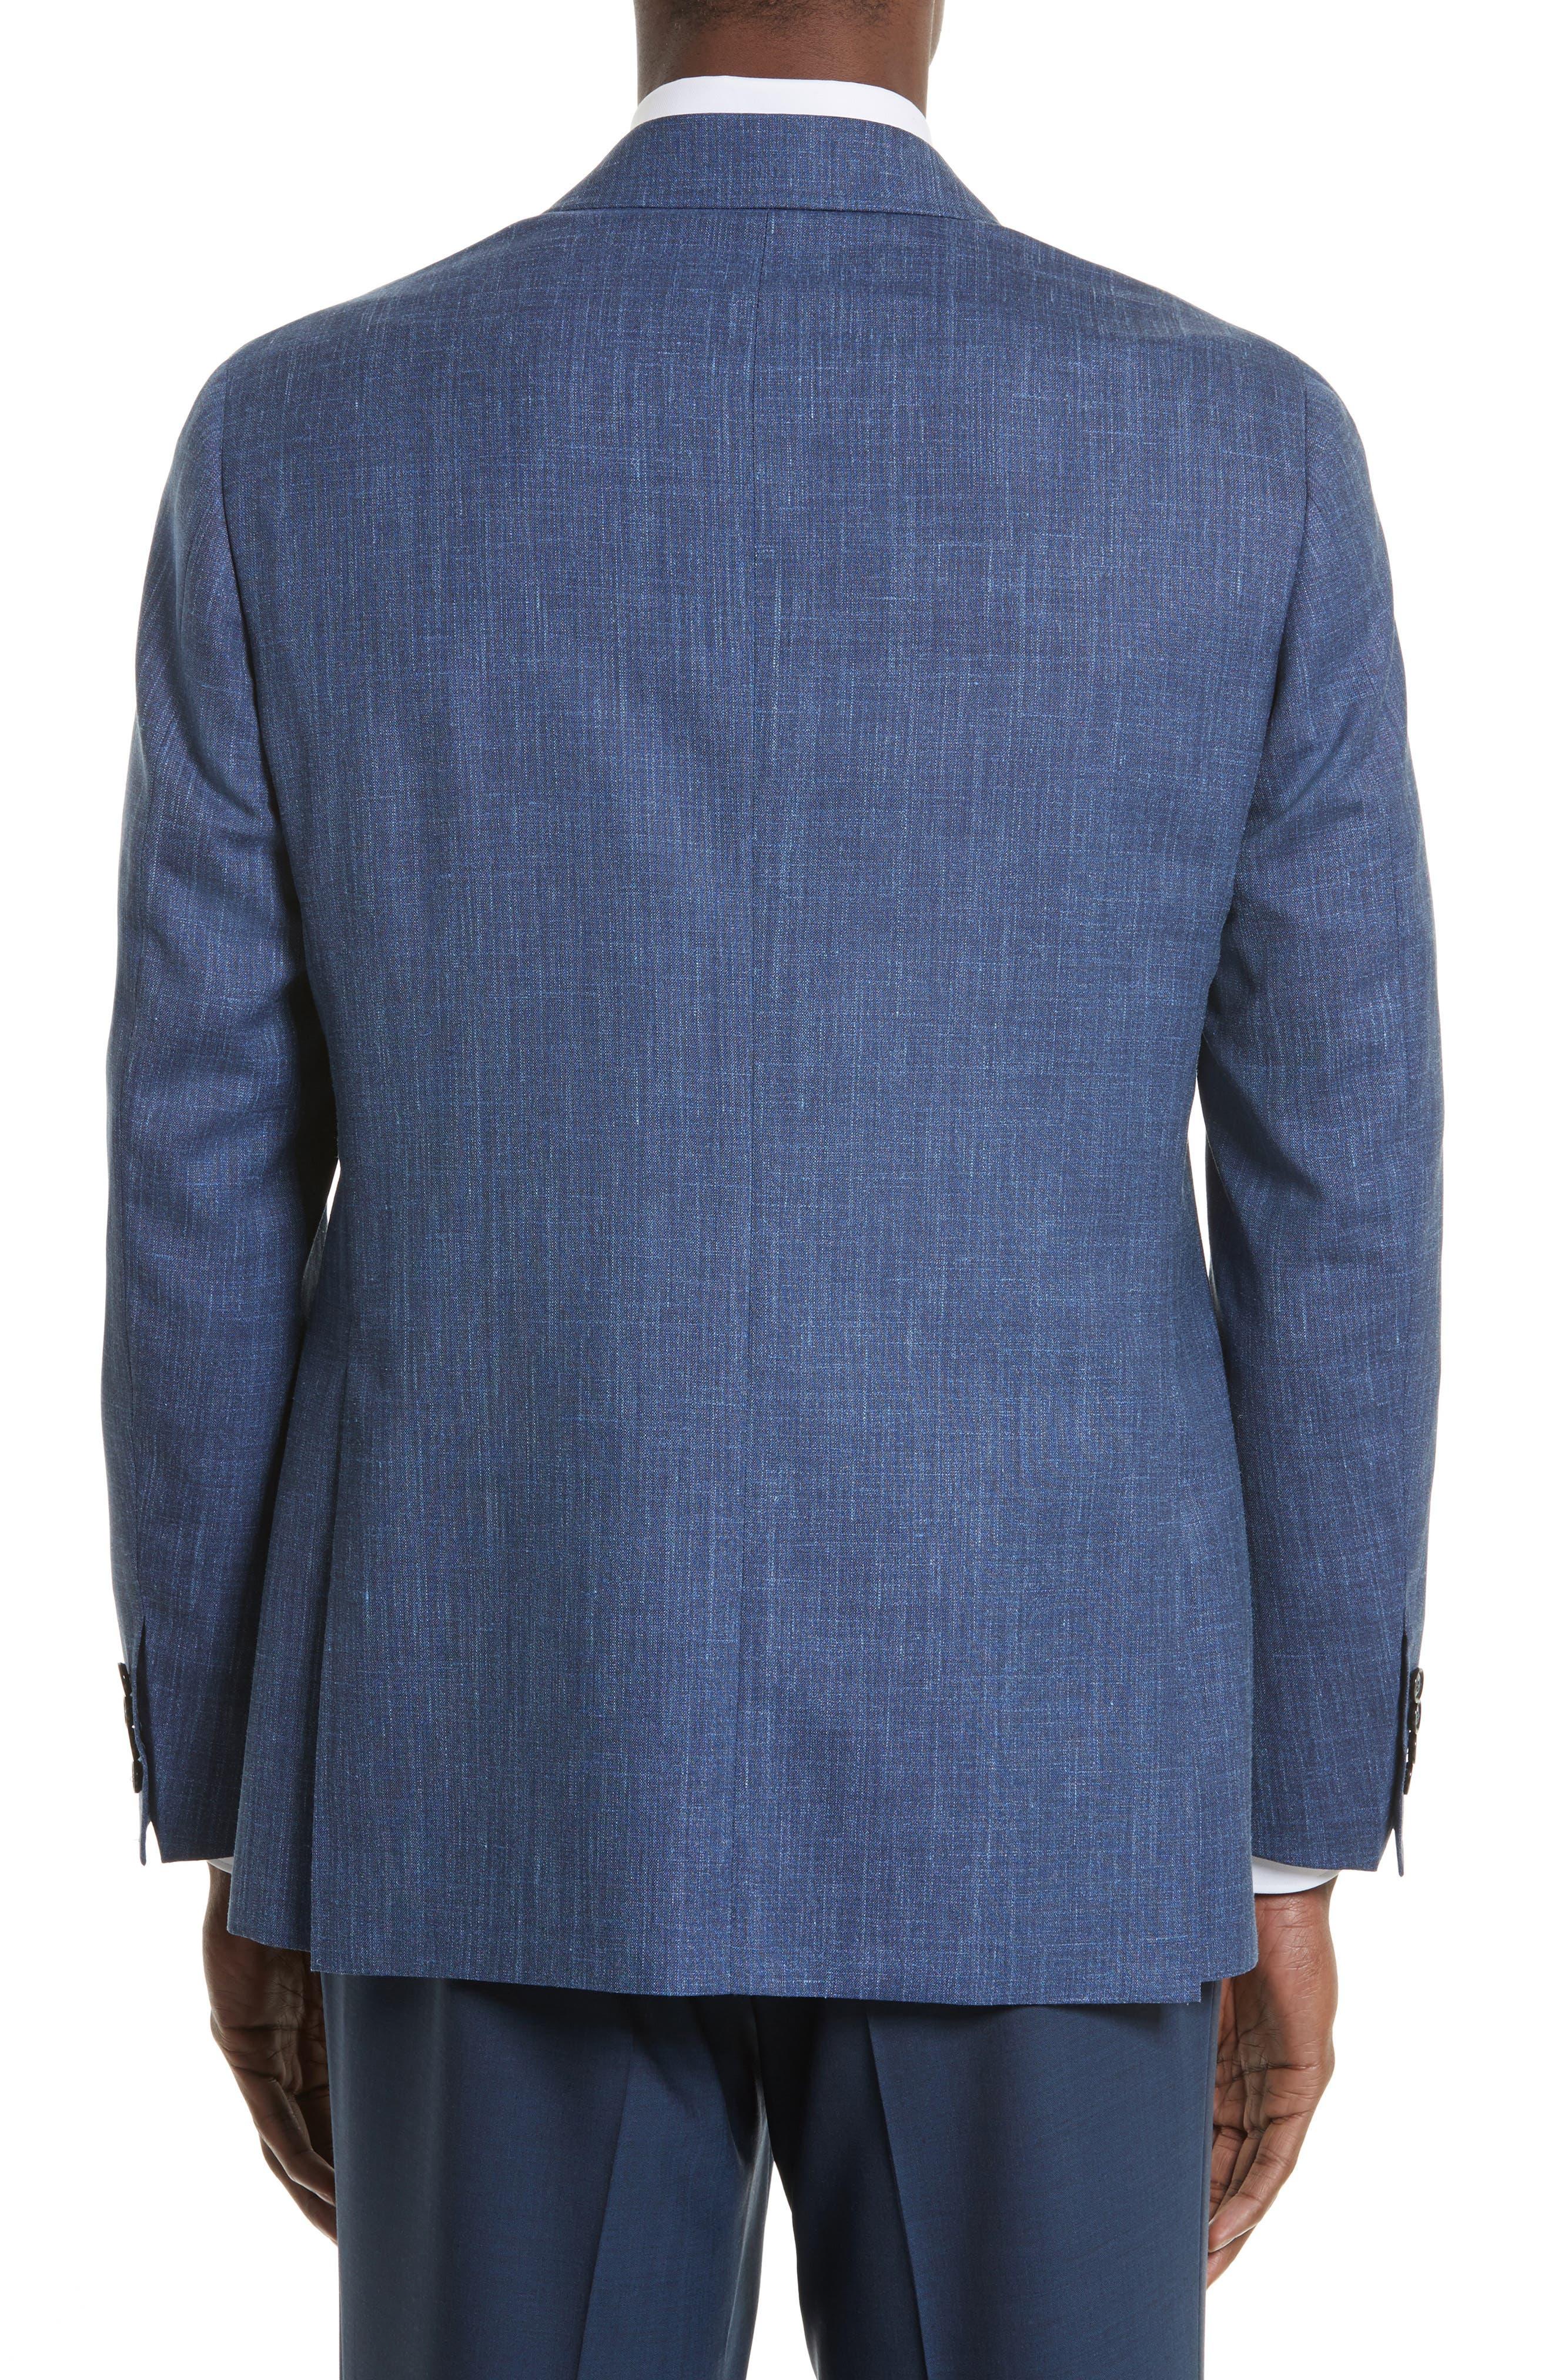 Kei Classic Fit Wool Blend Blazer,                             Alternate thumbnail 2, color,                             400